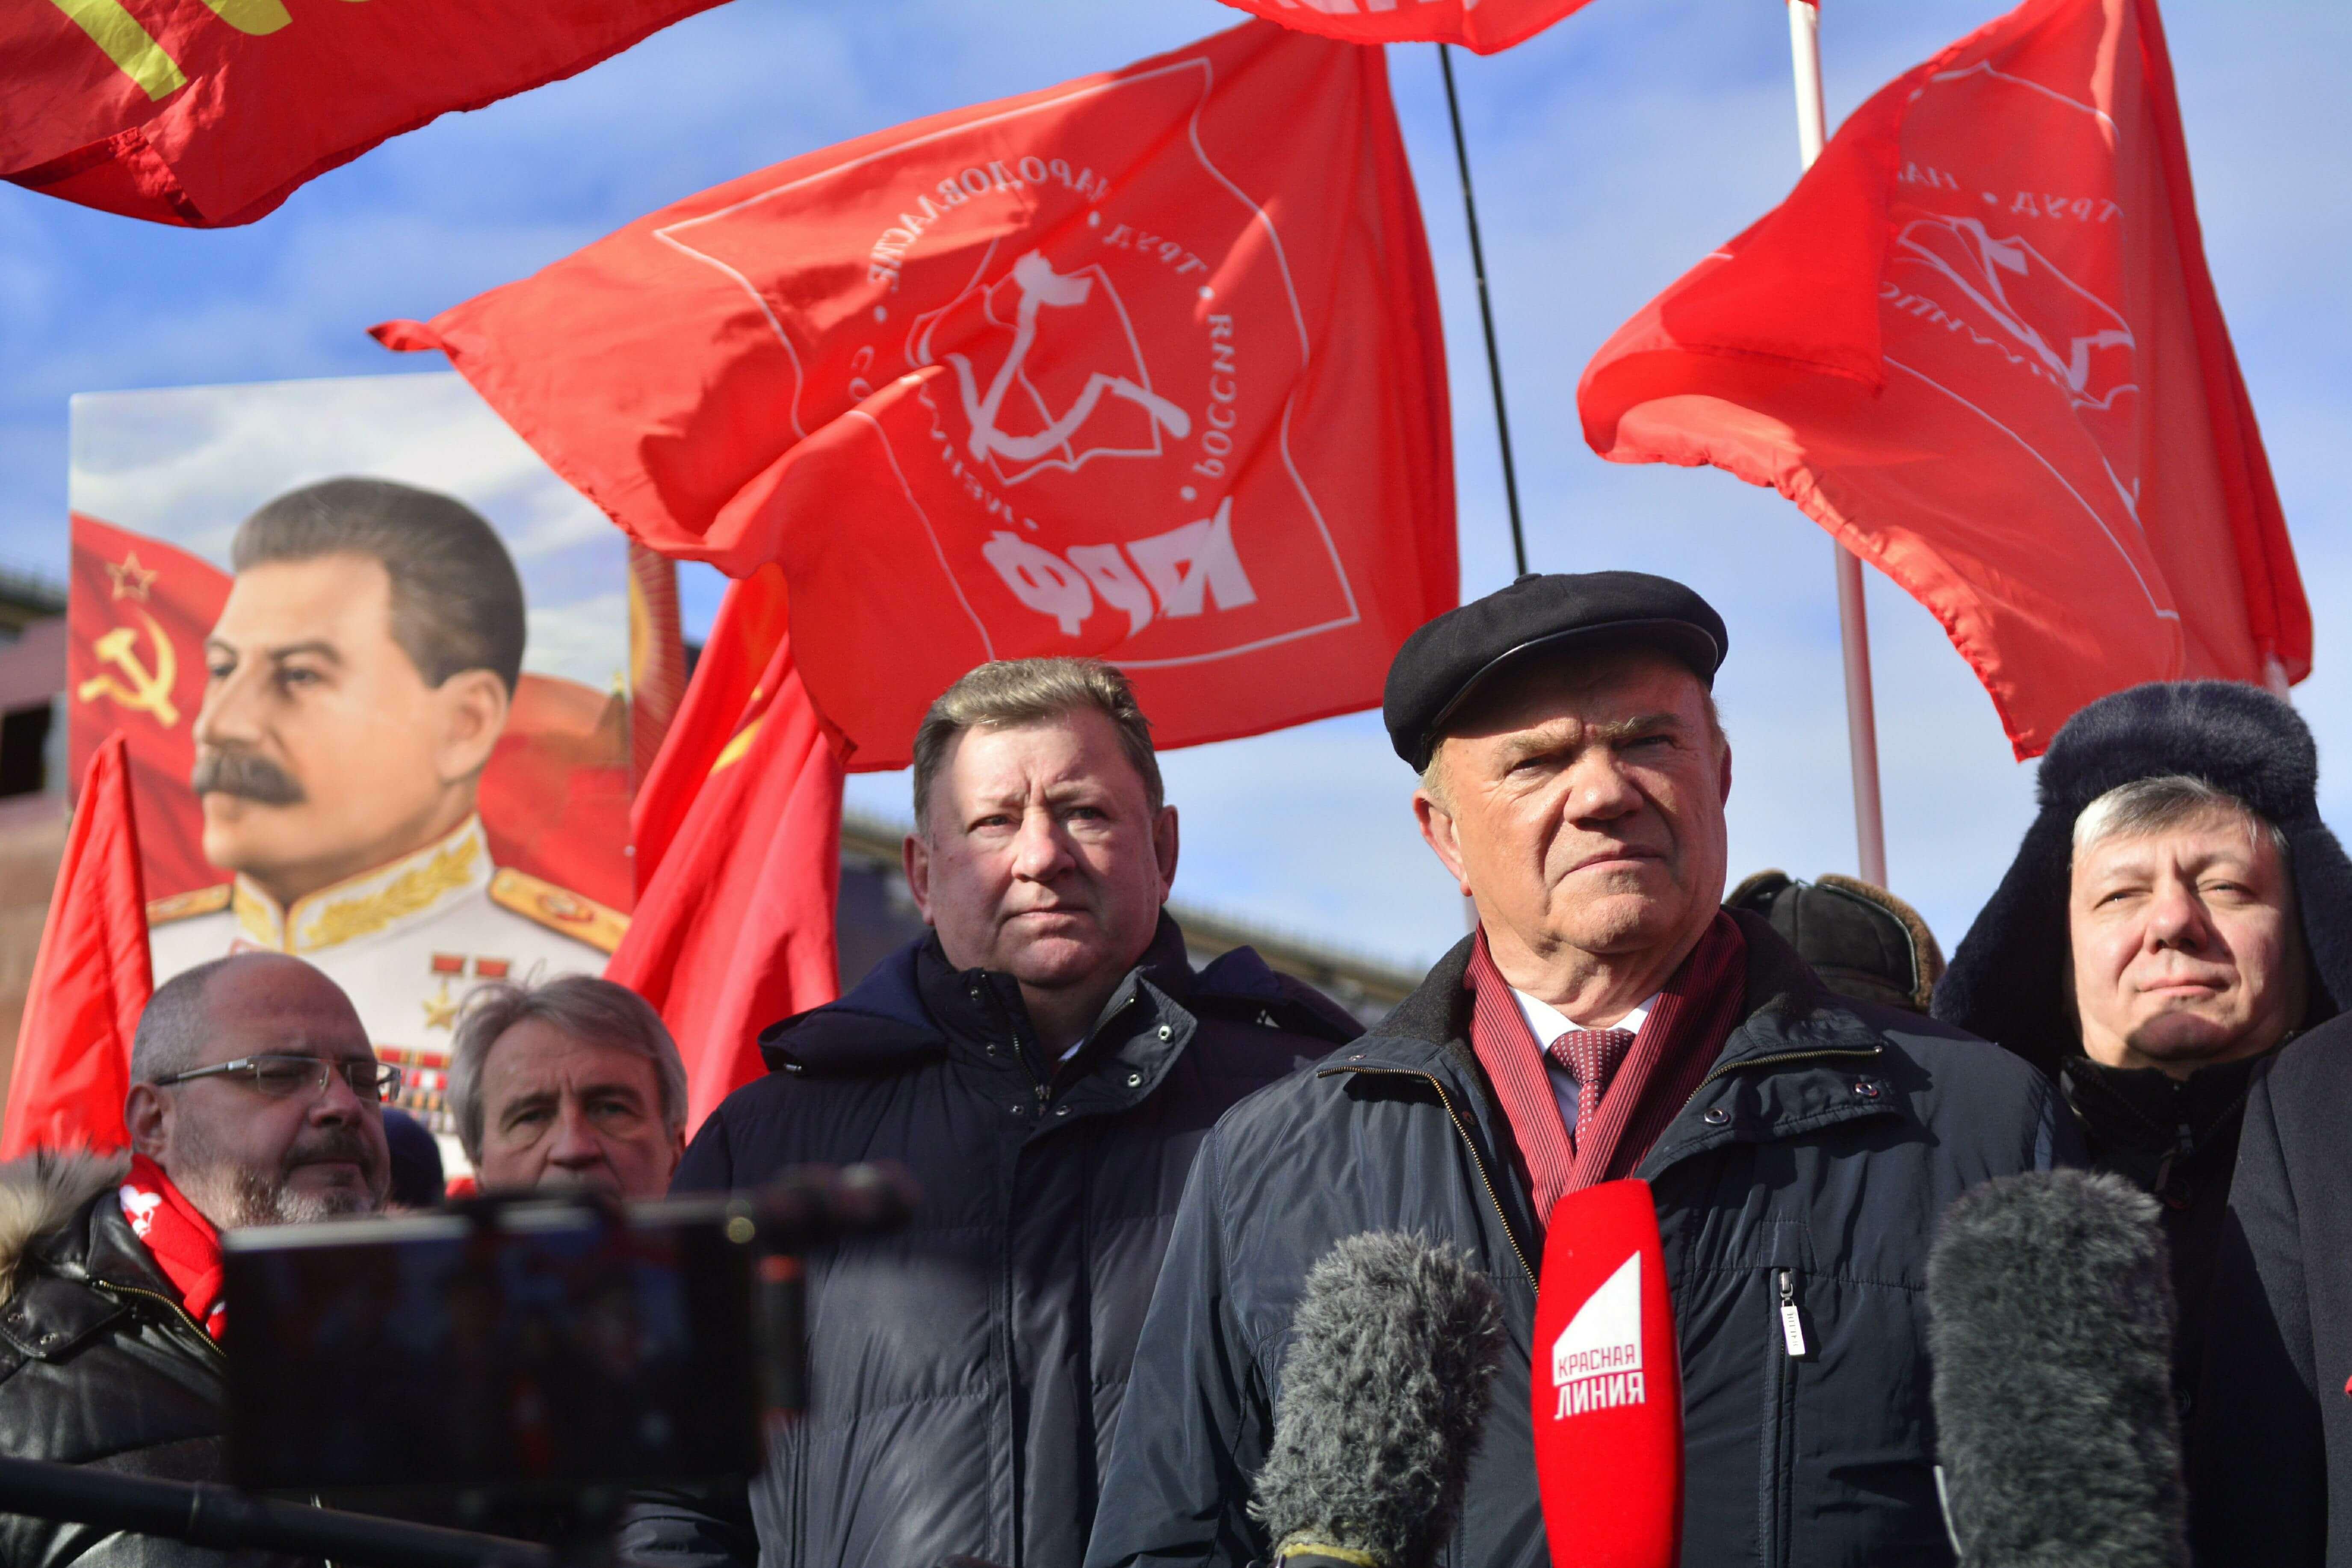 Pavel Kashaev/Globallookpress.com